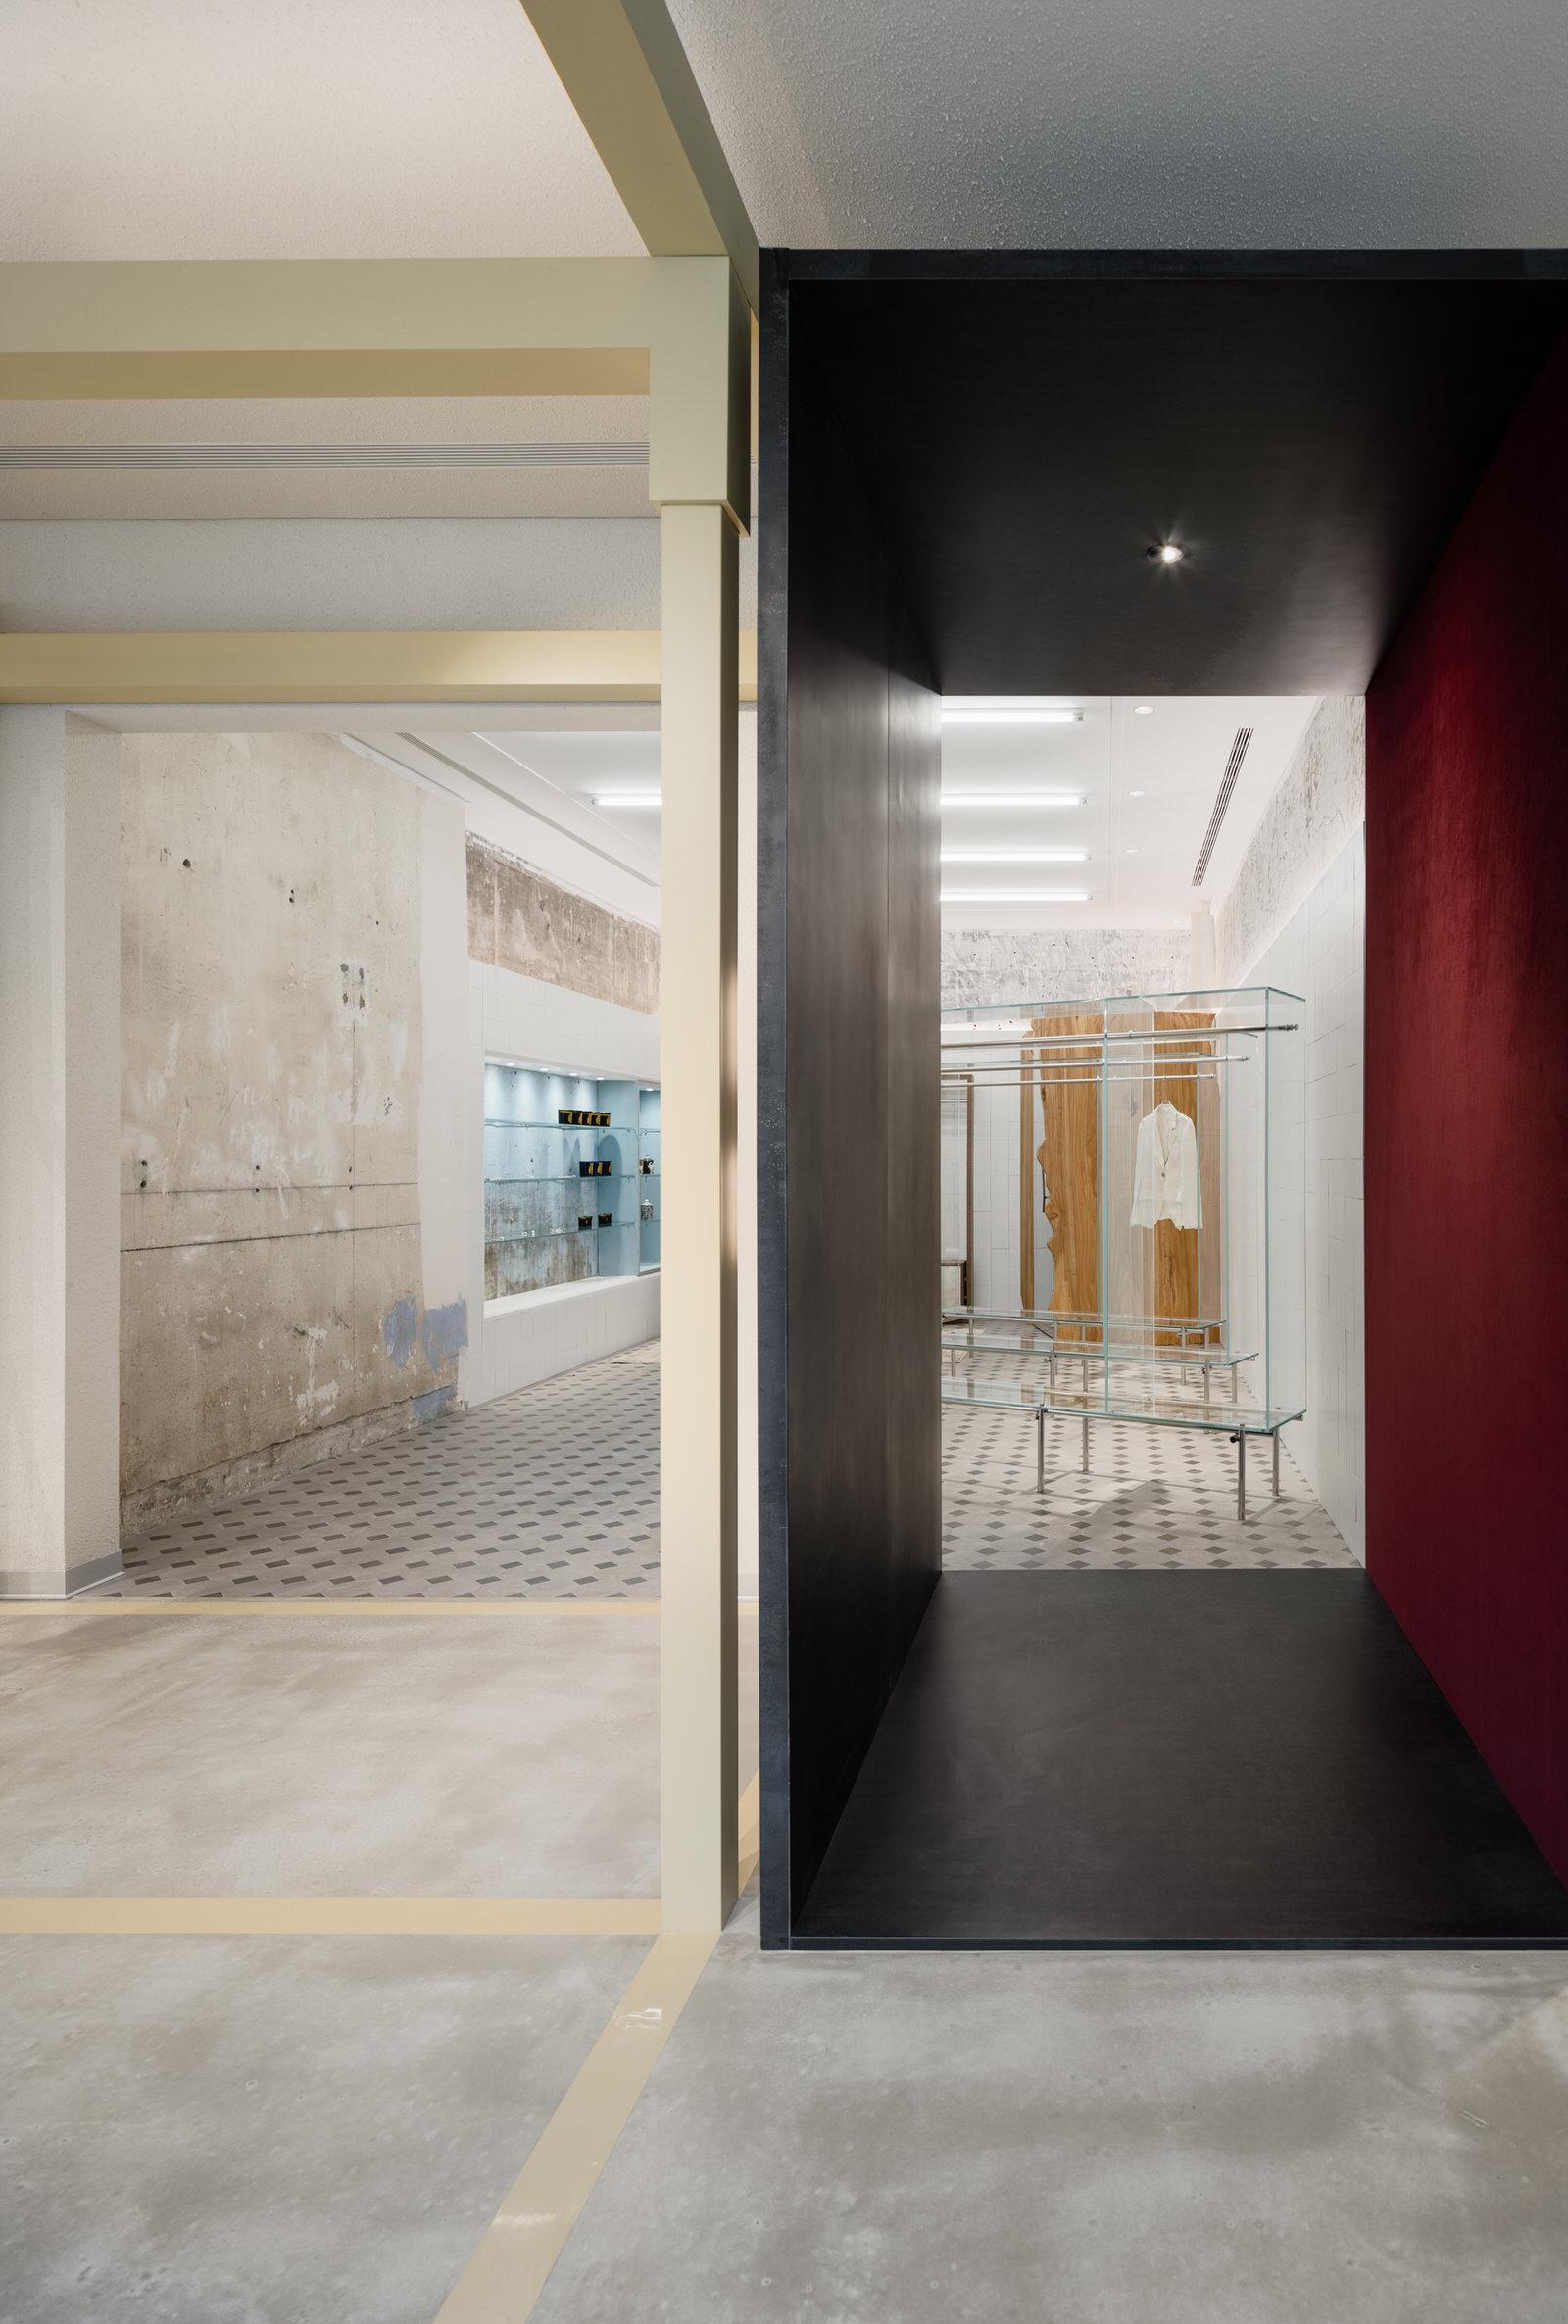 Artist in Residence: LOOKNOW Flagship Store by Sò Studio.